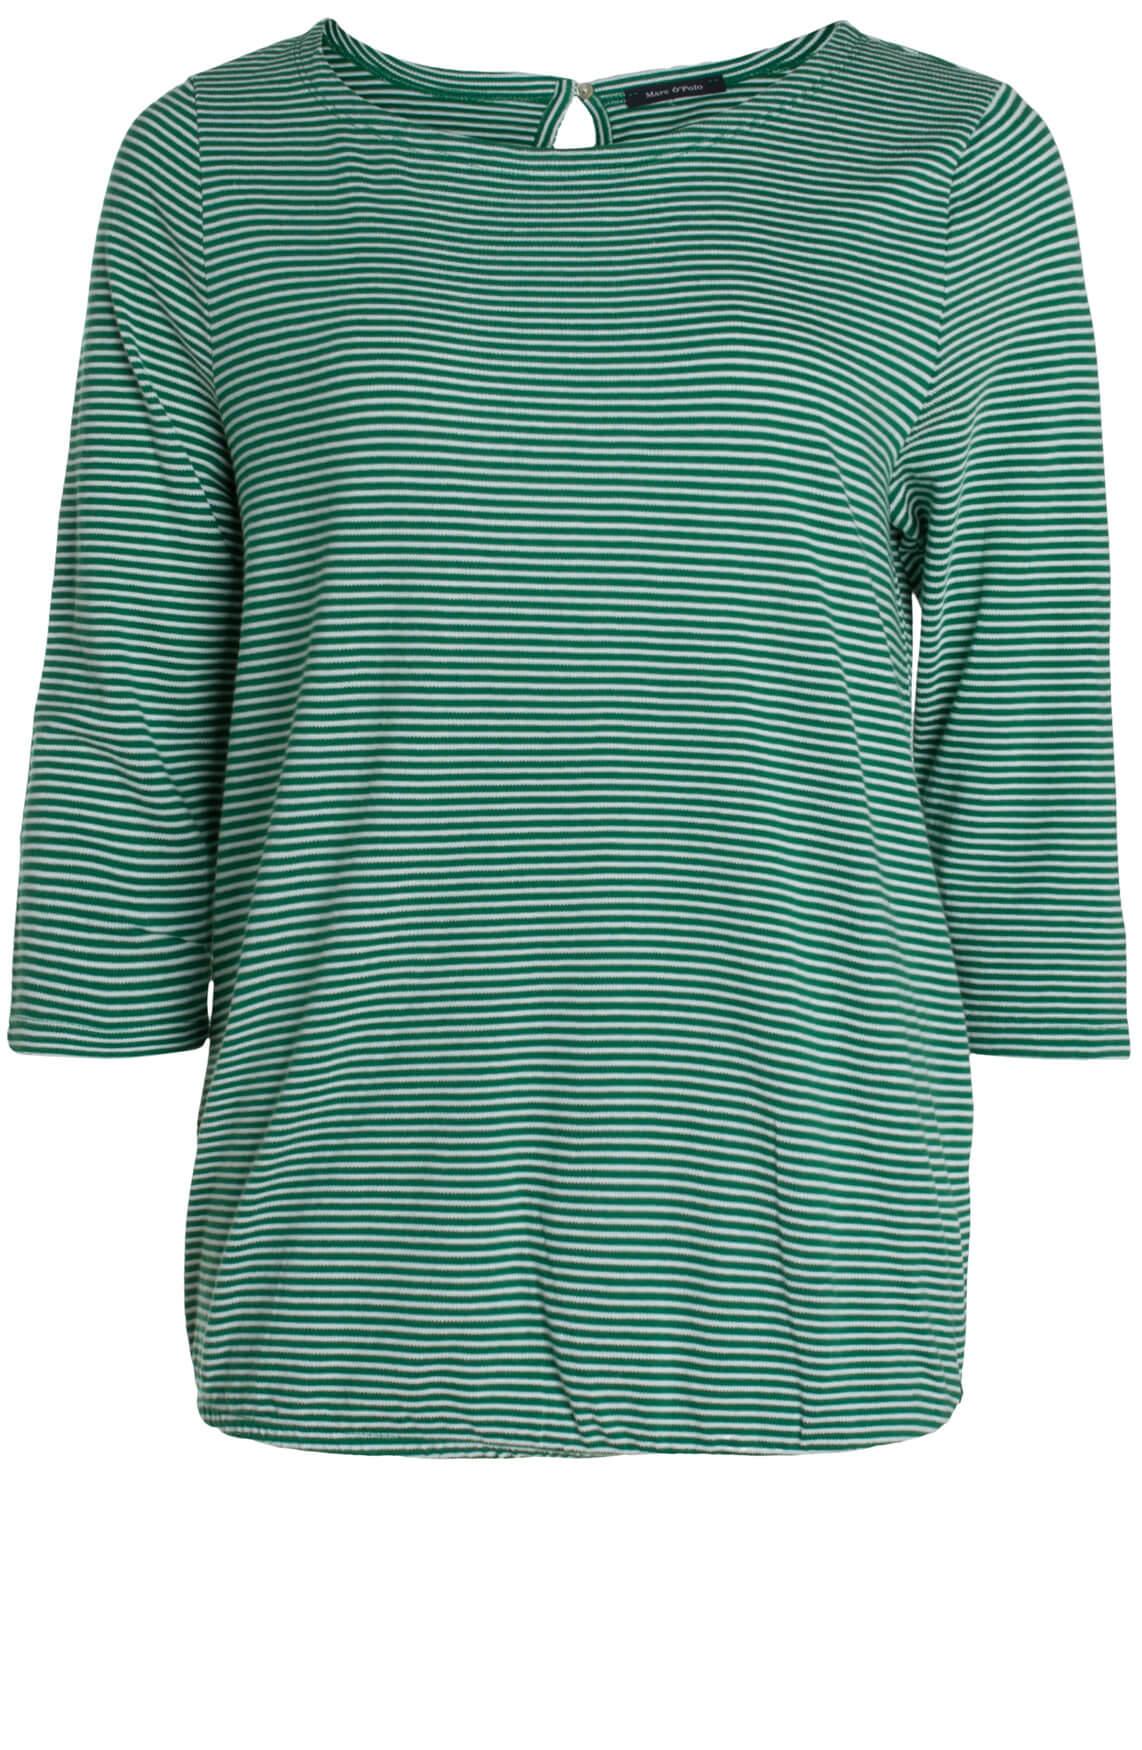 Marc O'Polo Dames Gestreept shirt groen